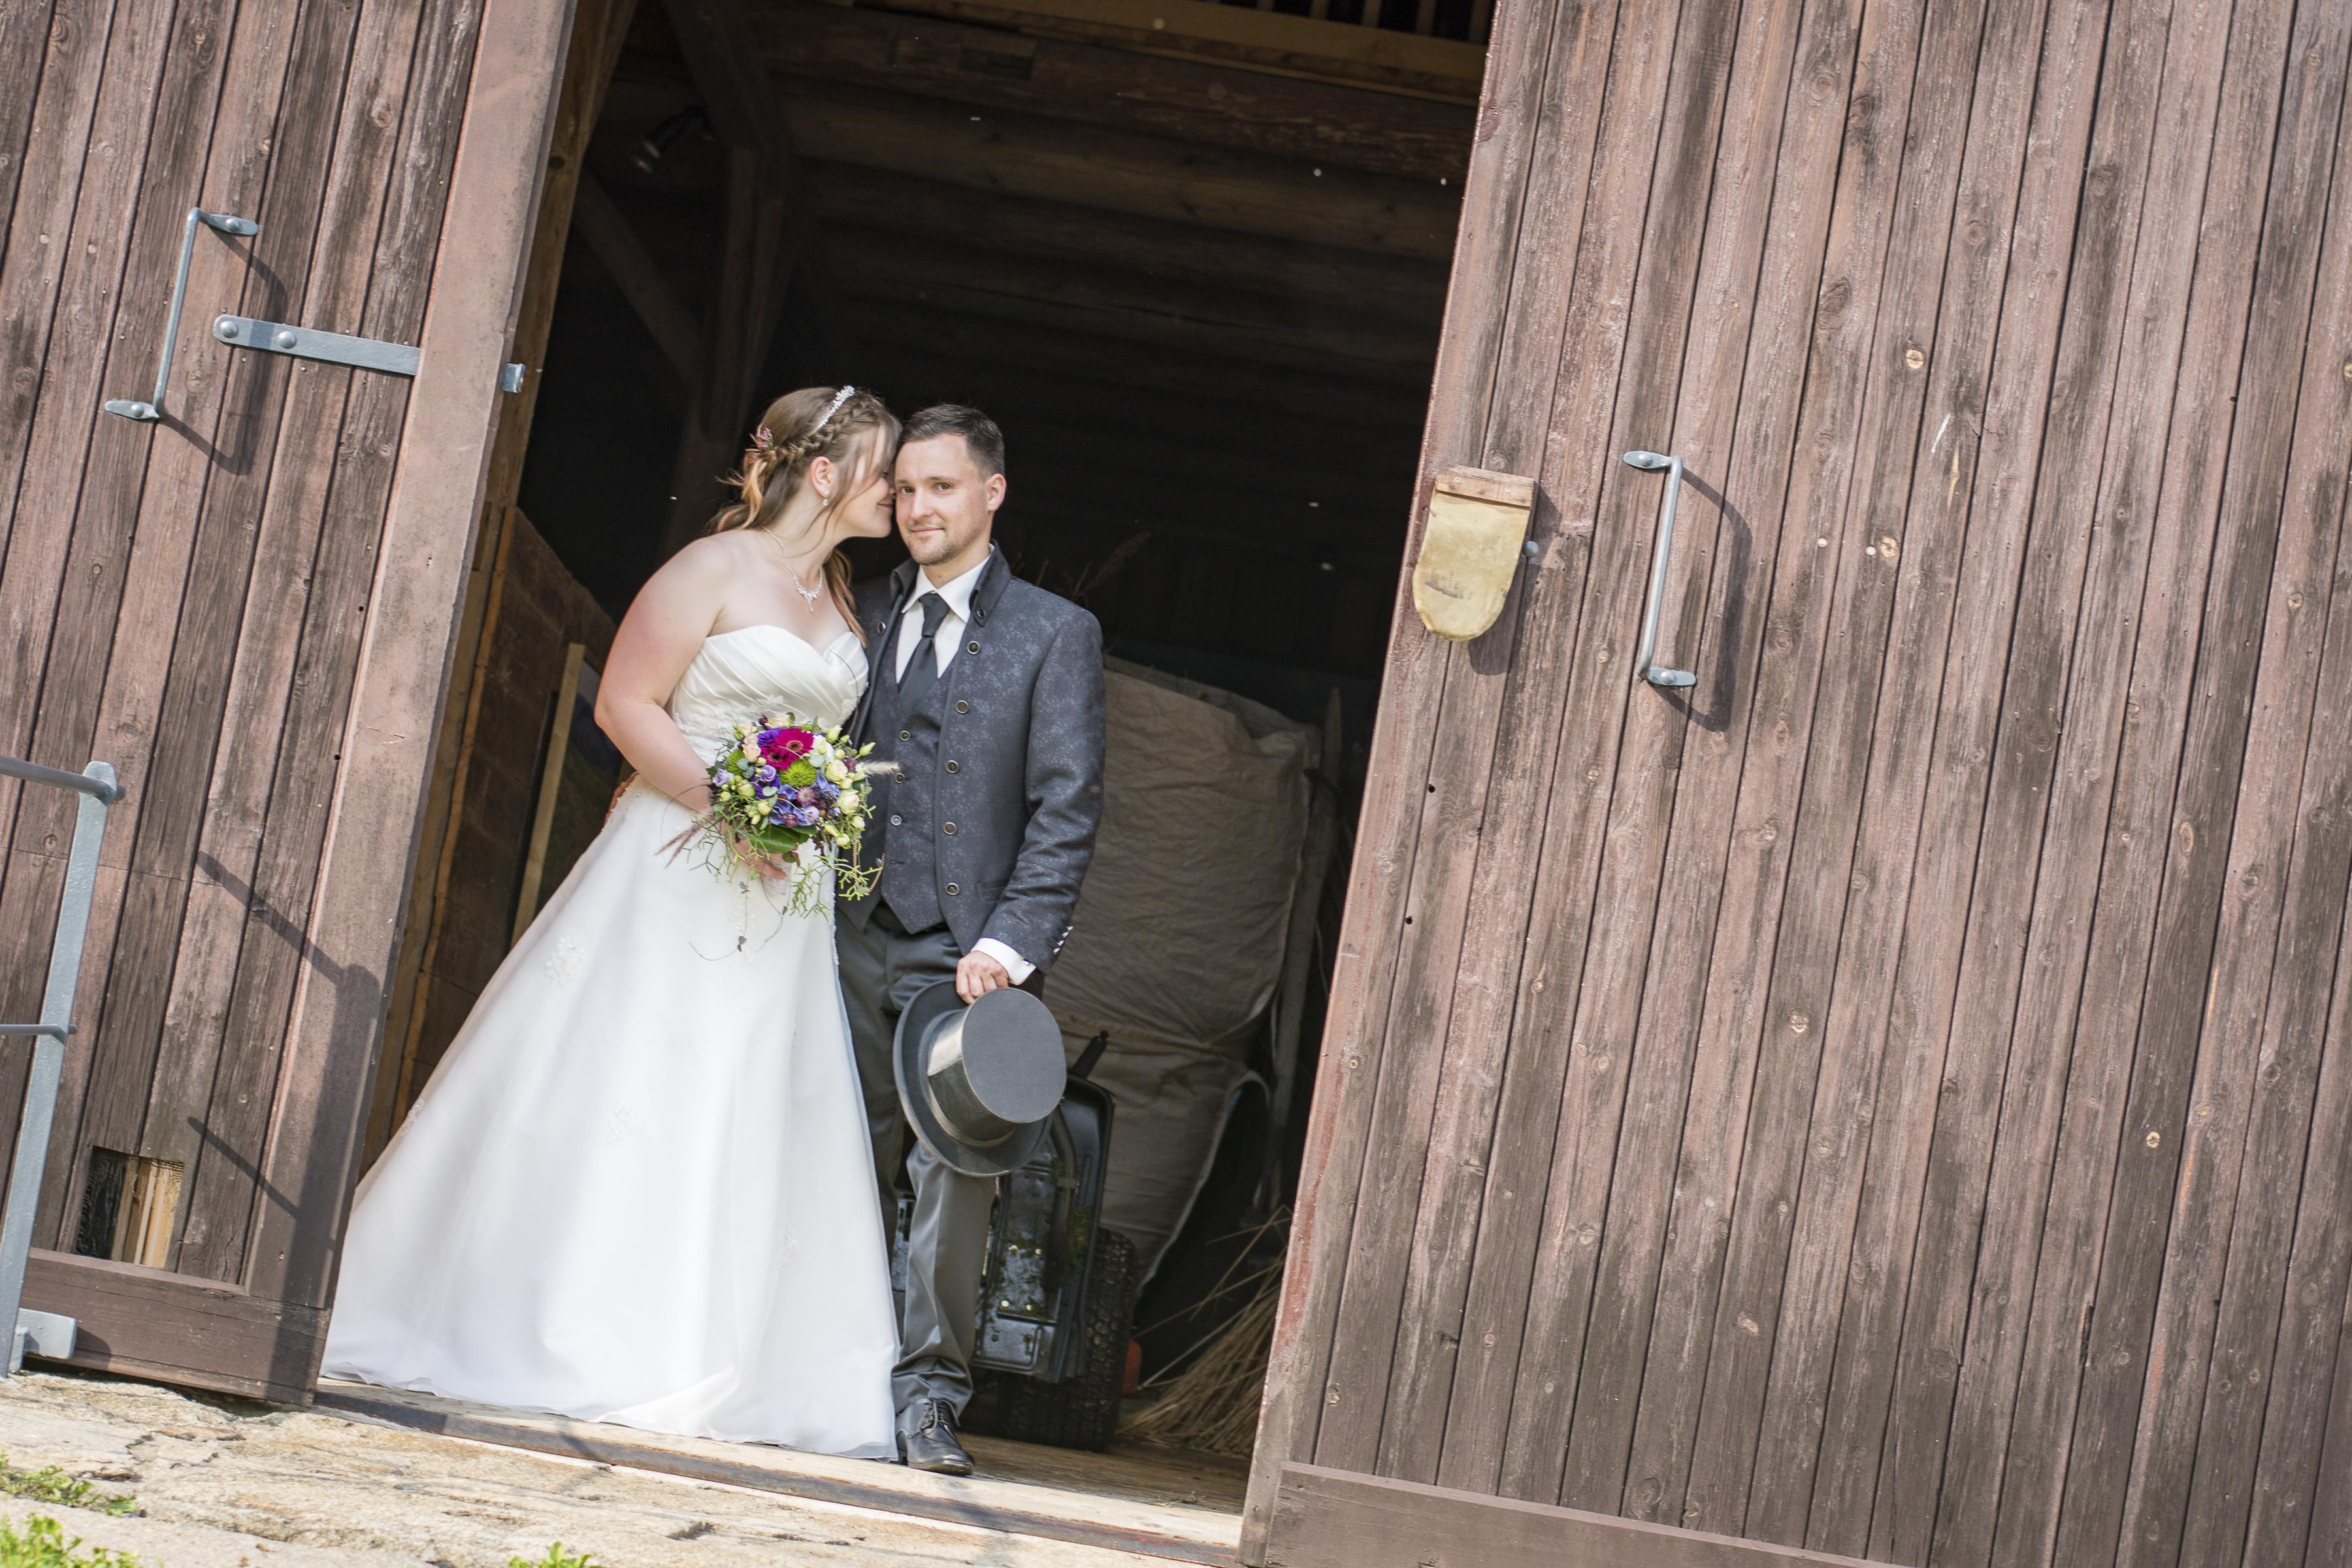 https://sleeklens.com/wp-content/uploads/2018/09/wedding-lightroom-presets-signature-bride-groom-before-6.jpg